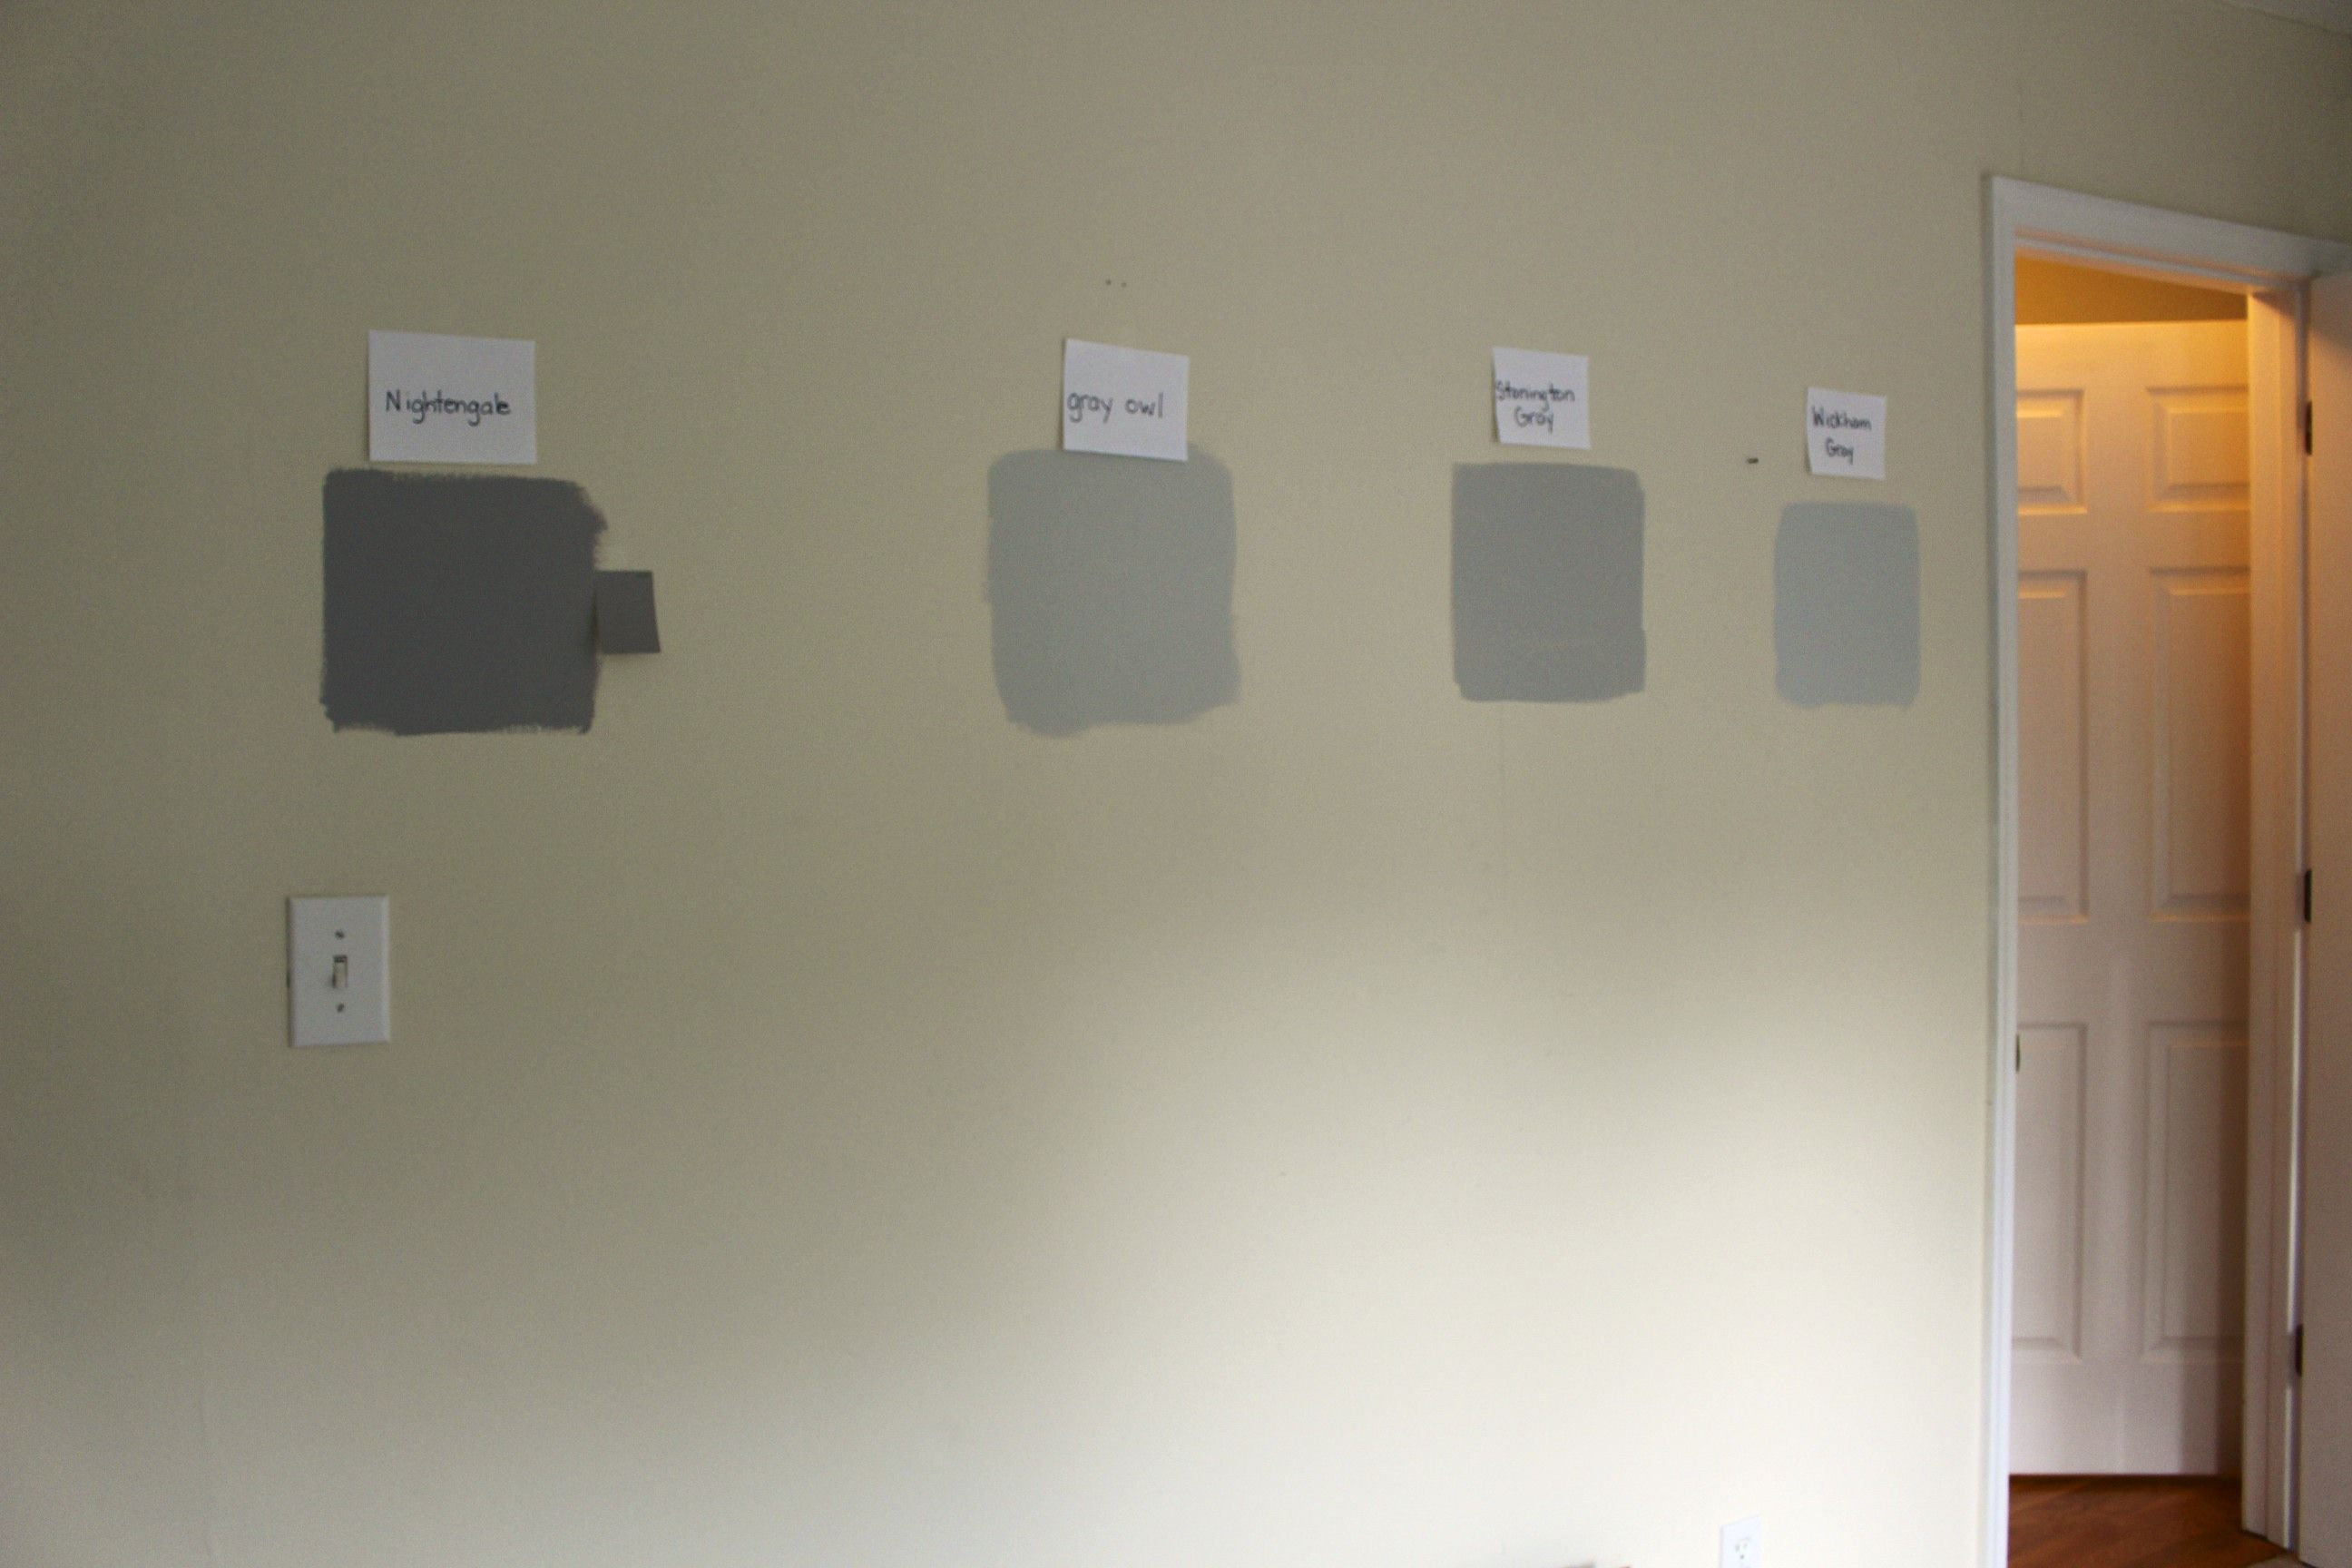 Gray Owl Vs Stonington Gray Shades Of Grey Grey Walls Interior Paint Colors